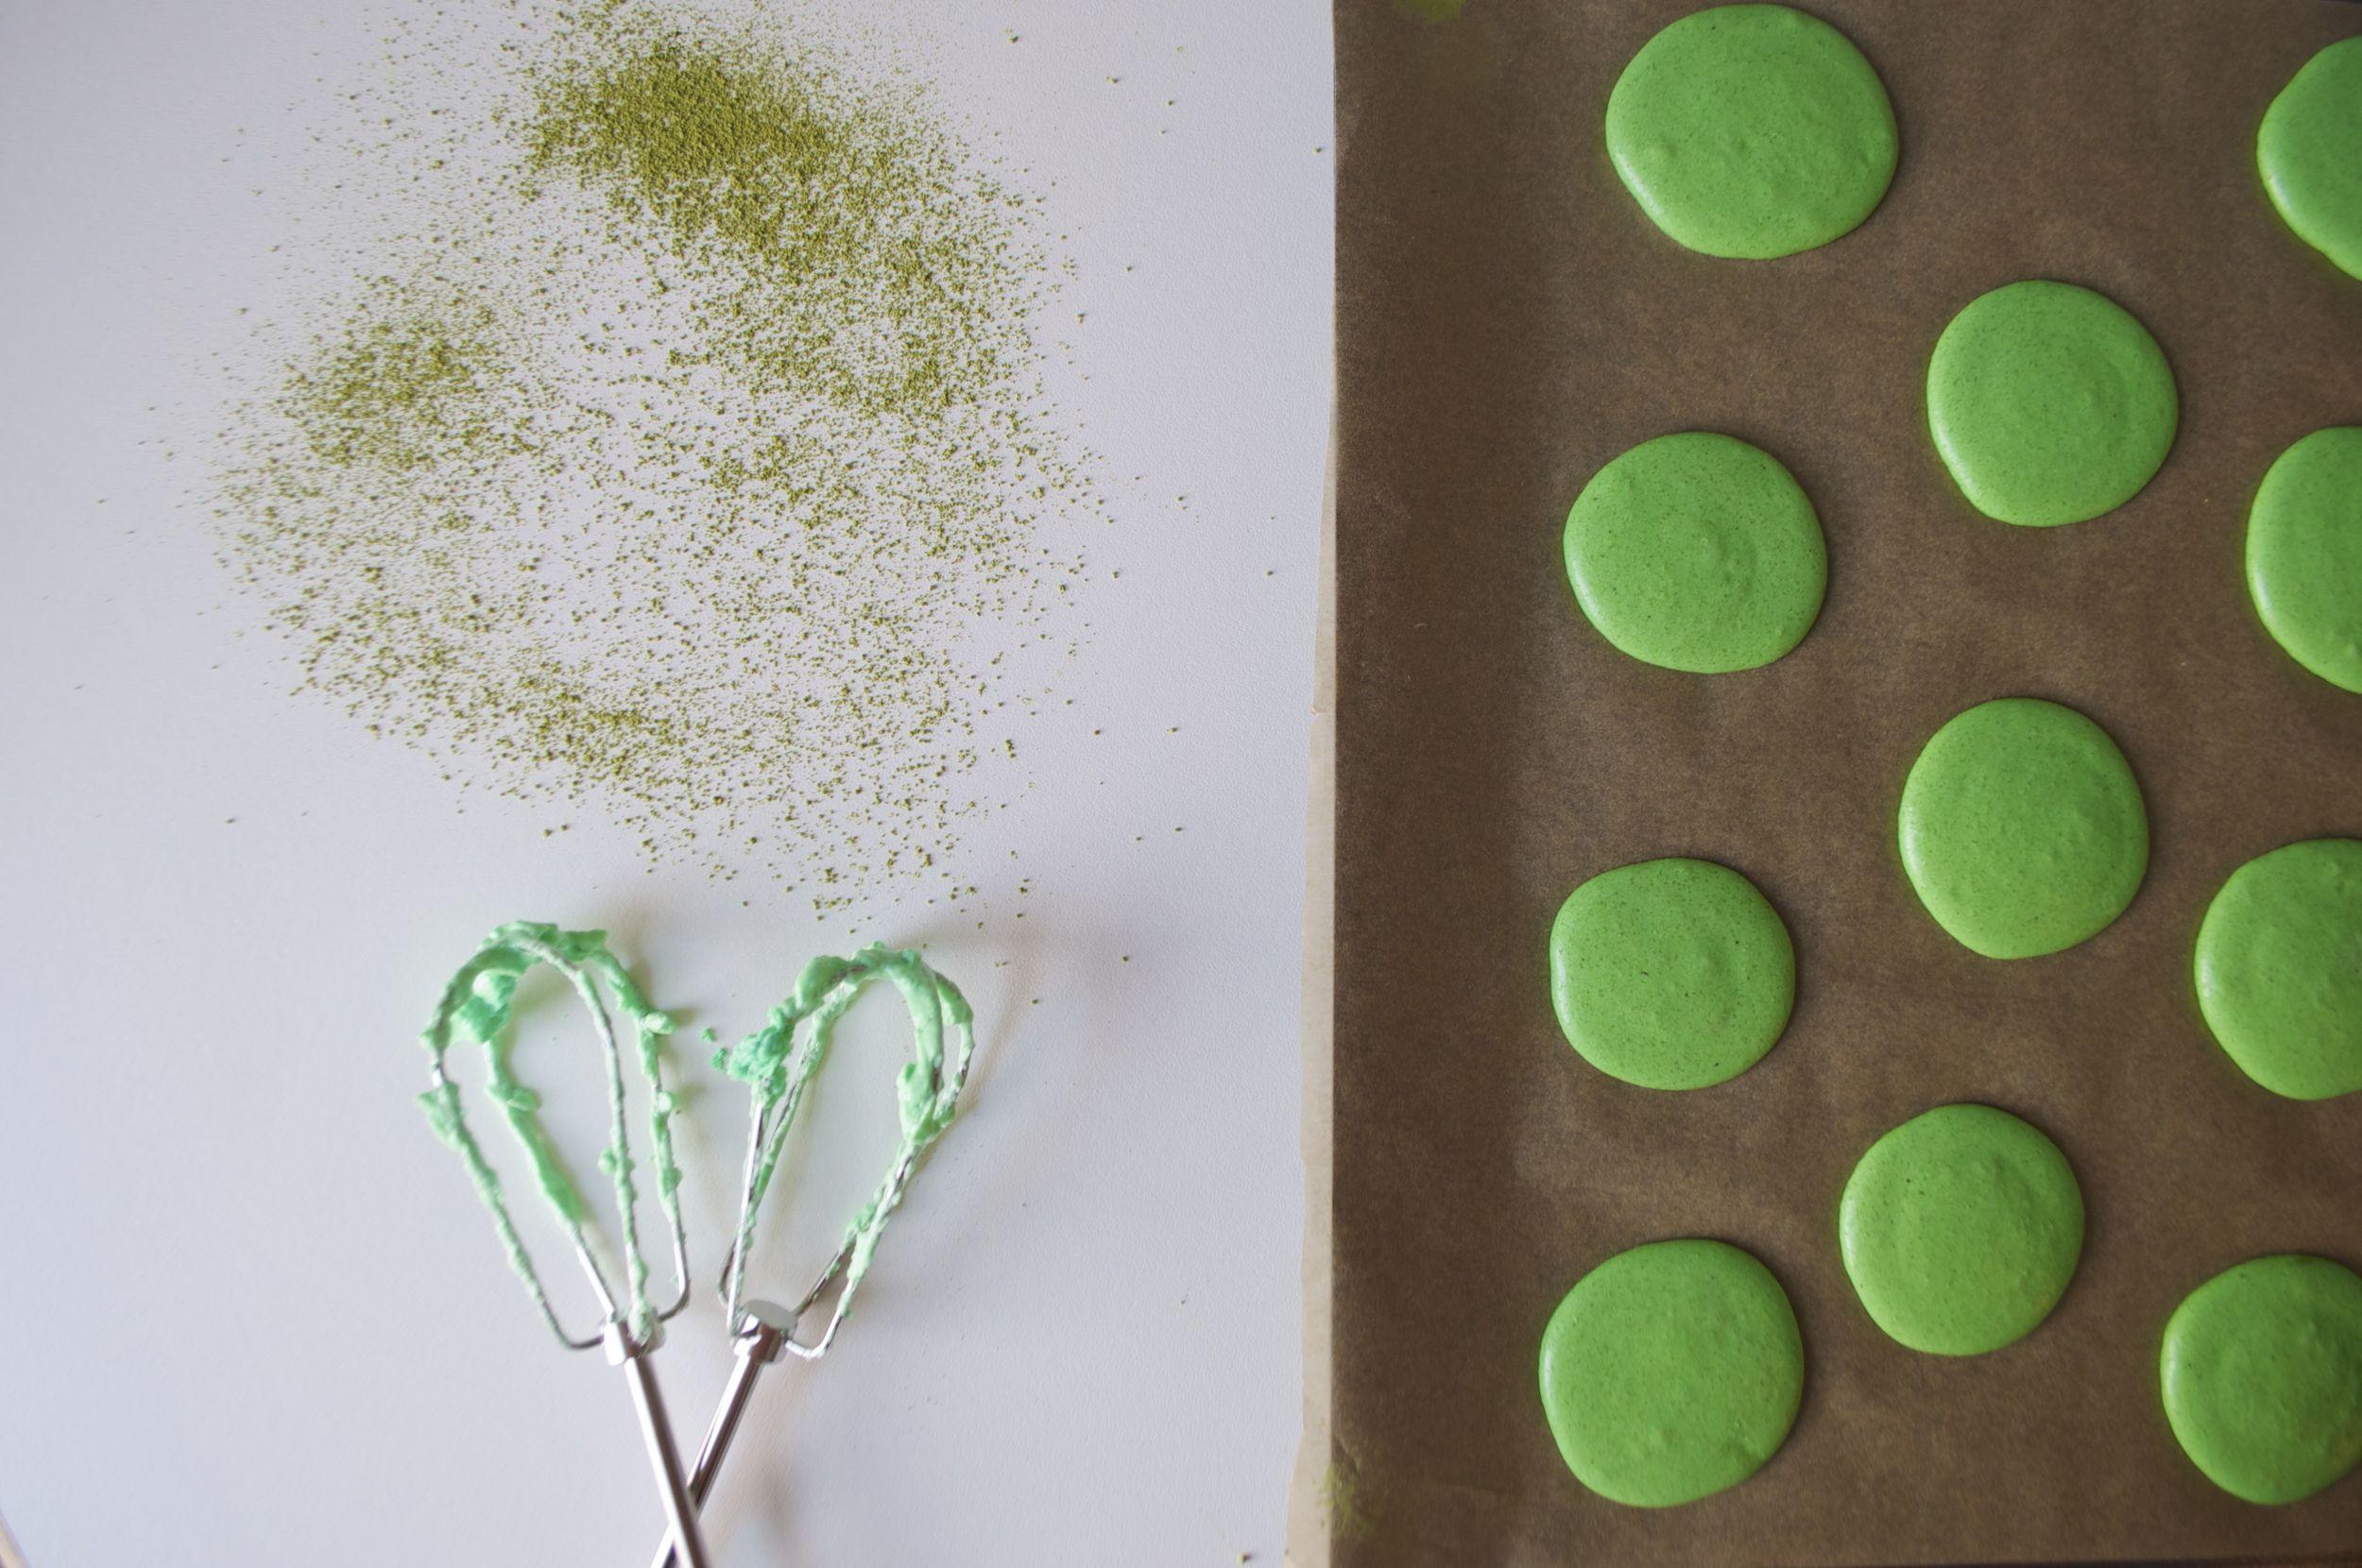 matcha-macarons-fried-parsley